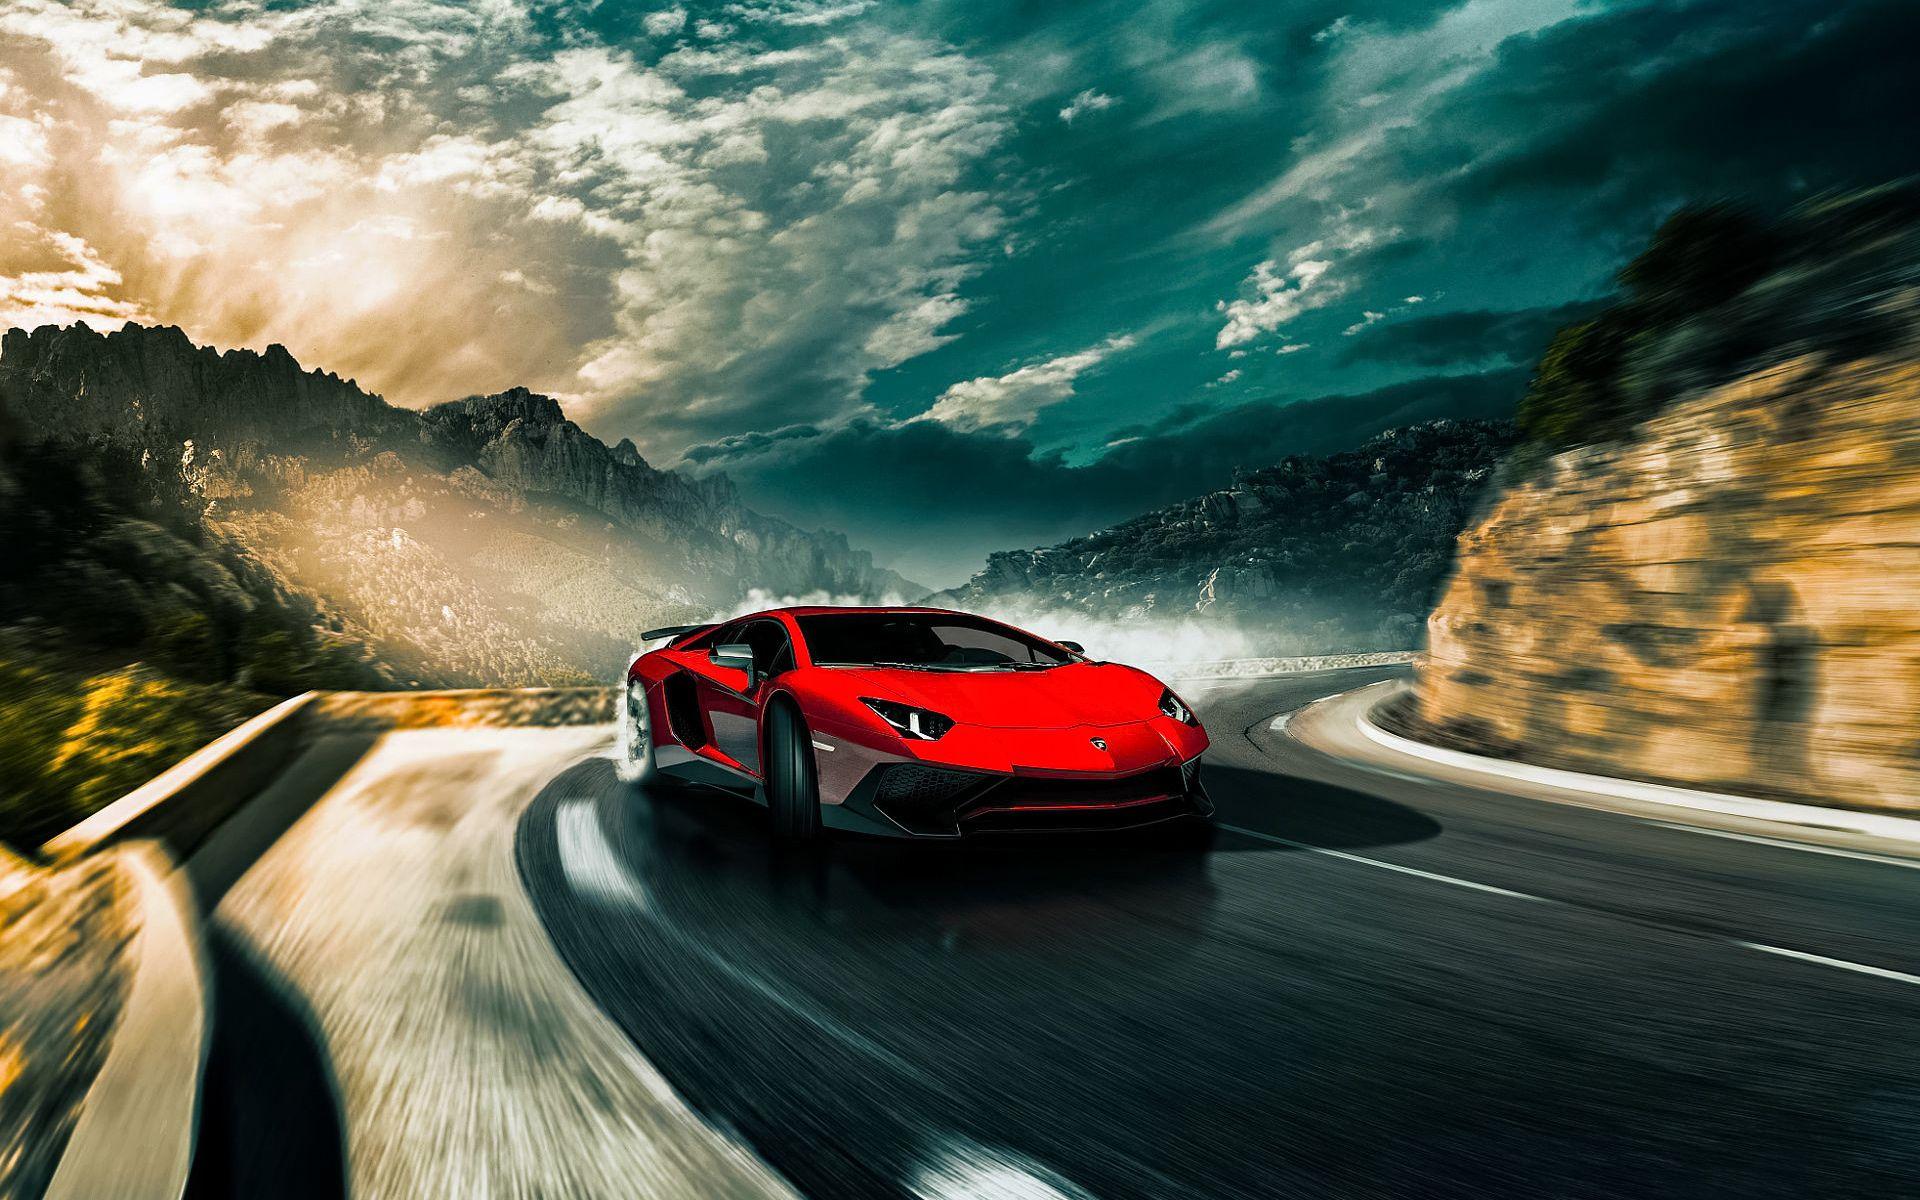 Ordinaire Lamborghini Aventador Superveloce RWD By DasHnezzPhotography